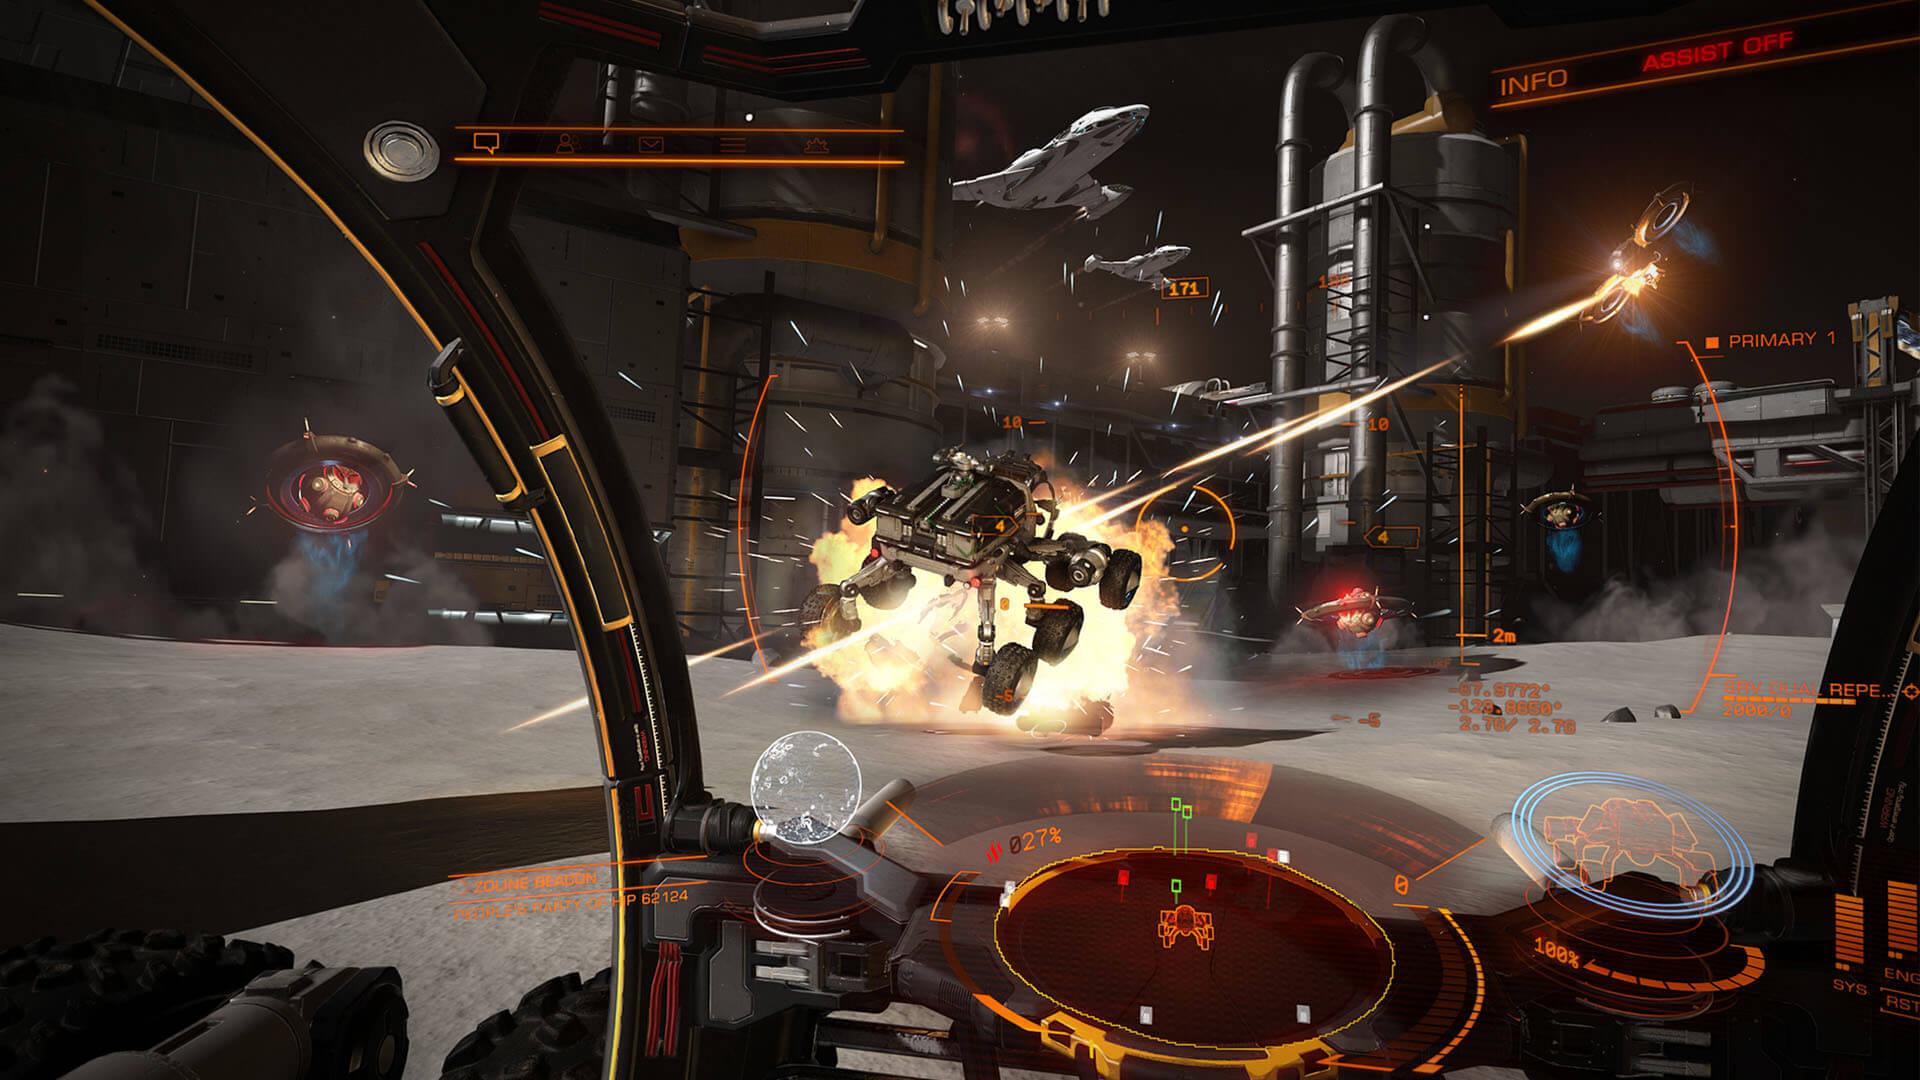 Elite dangereous online uzay oyunu